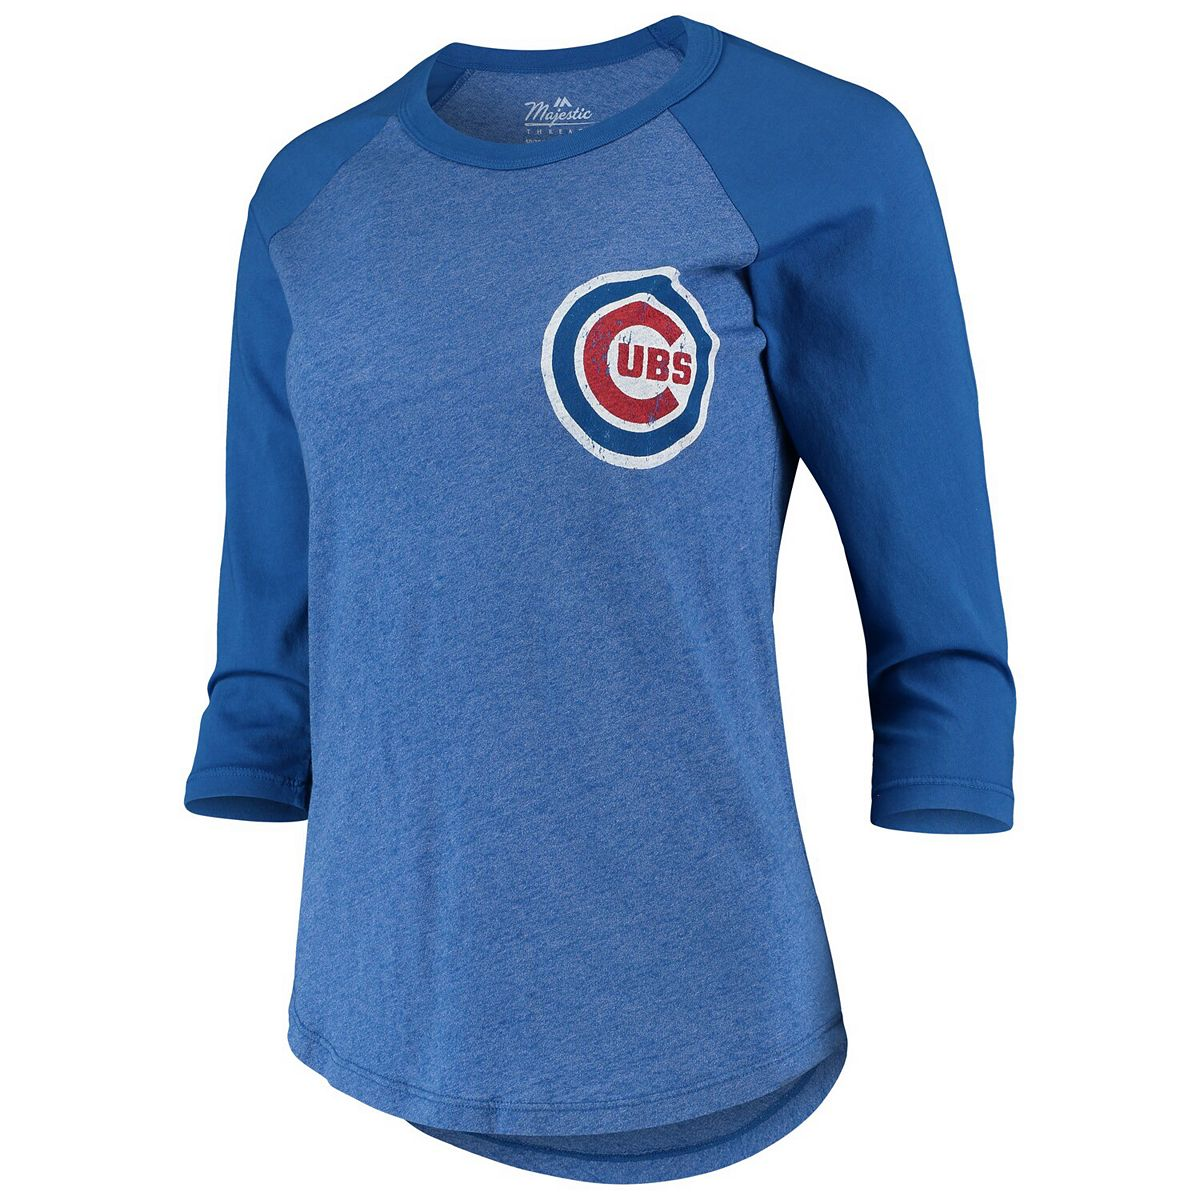 Women's Majestic Threads Javier Baez Royal Chicago Cubs Name & Number Tri-Blend Raglan 3/4-Sleeve T-Shirt zLQh8